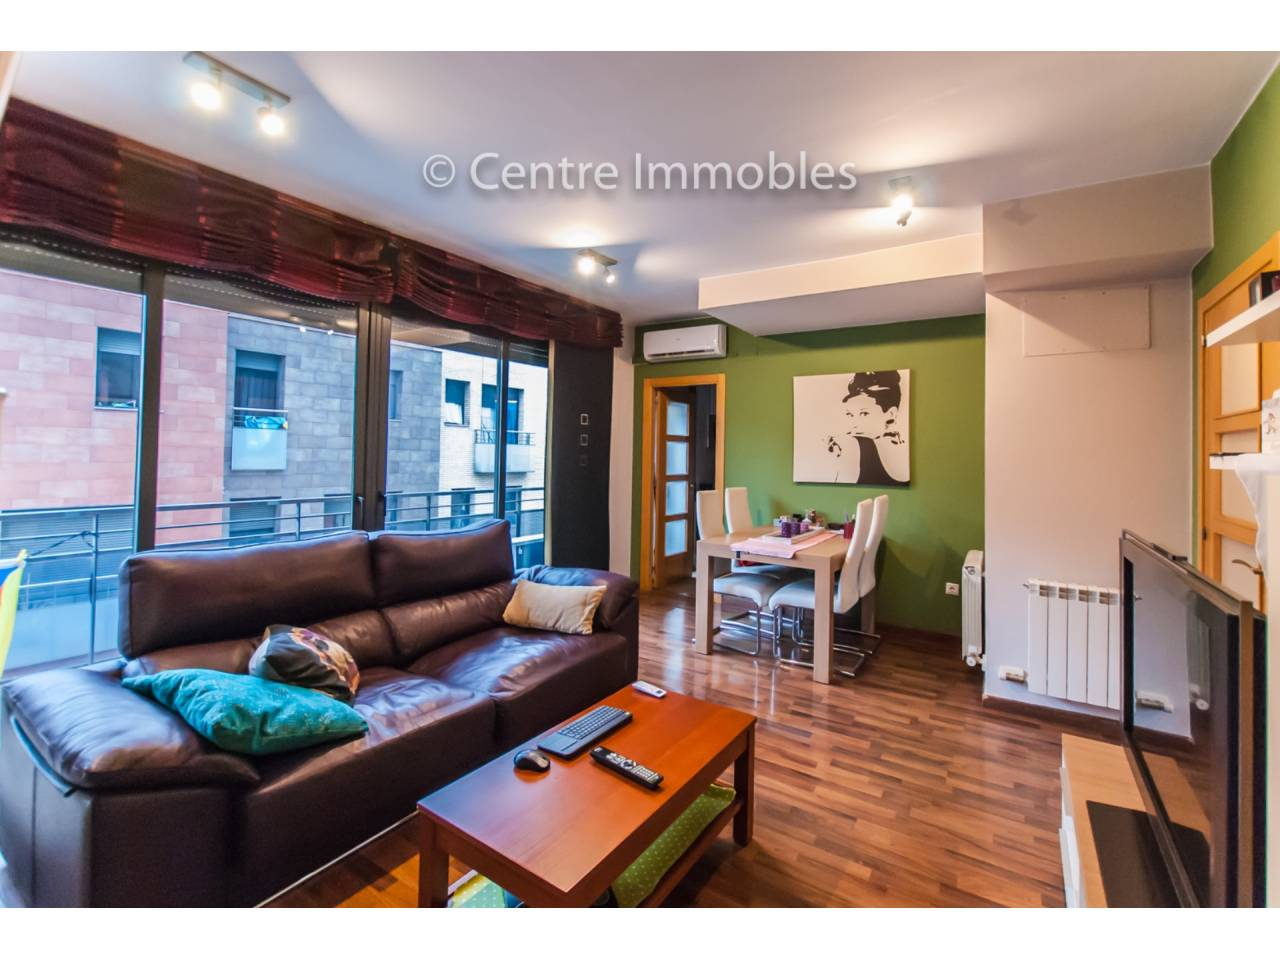 Duplex en venta en Torre-sana